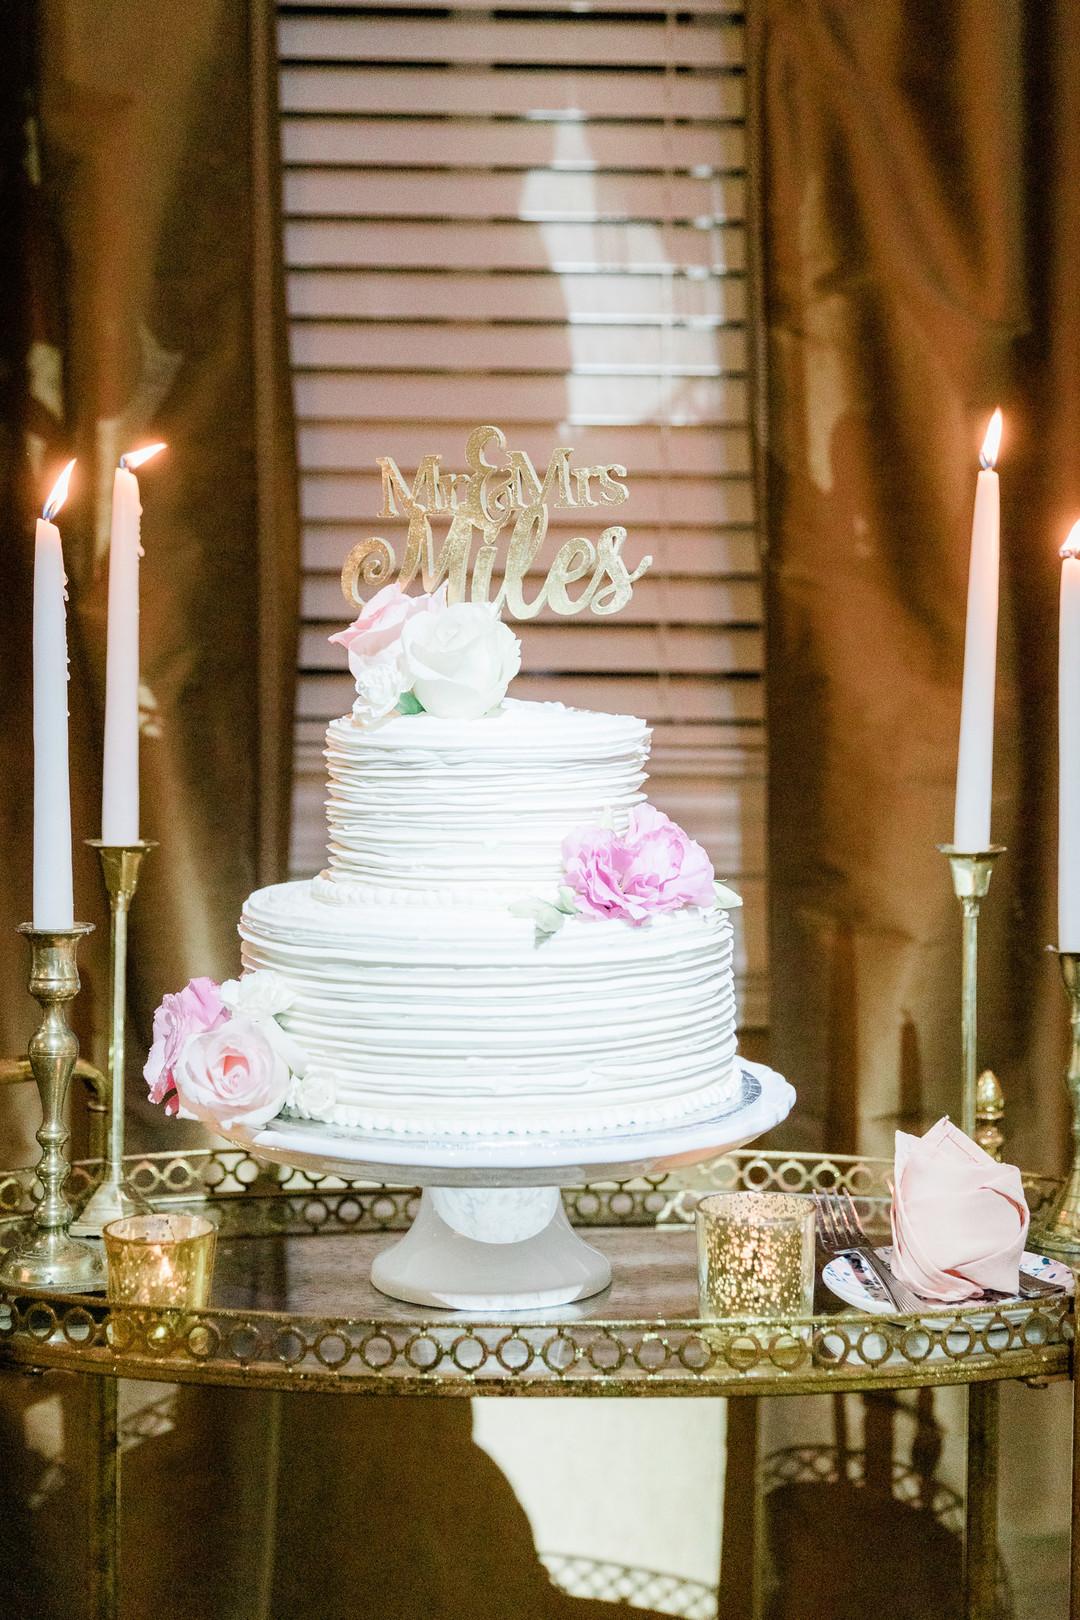 pawleys-plantation-wedding-29.jpg